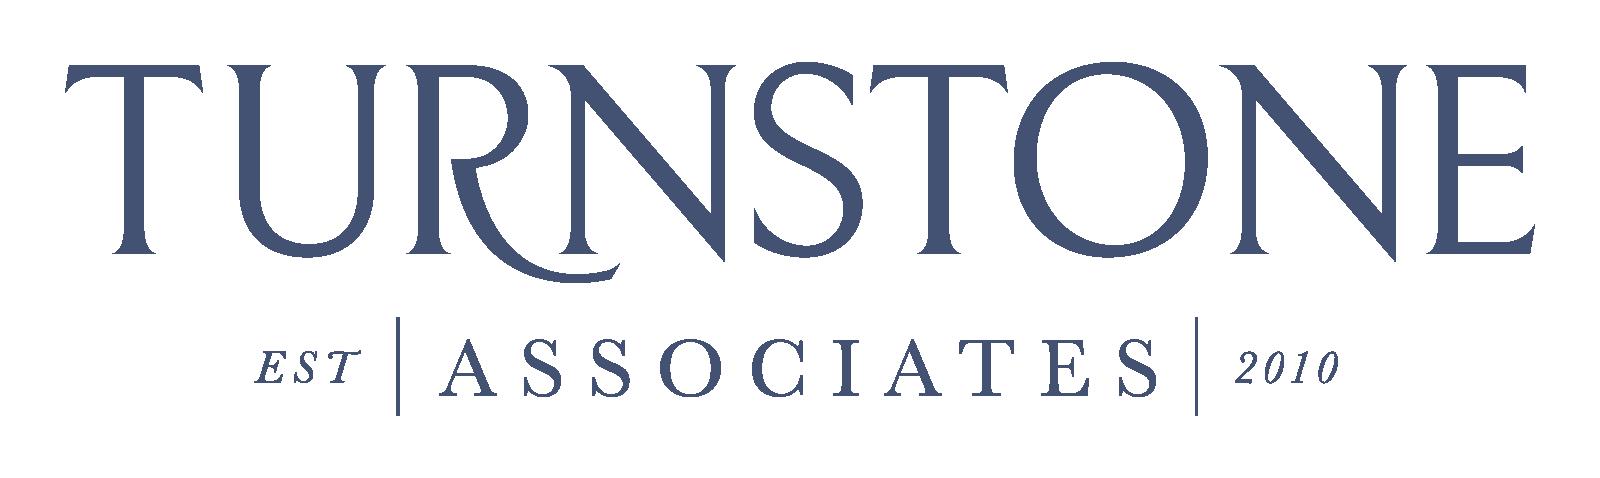 Turnstone Associates Logo Design